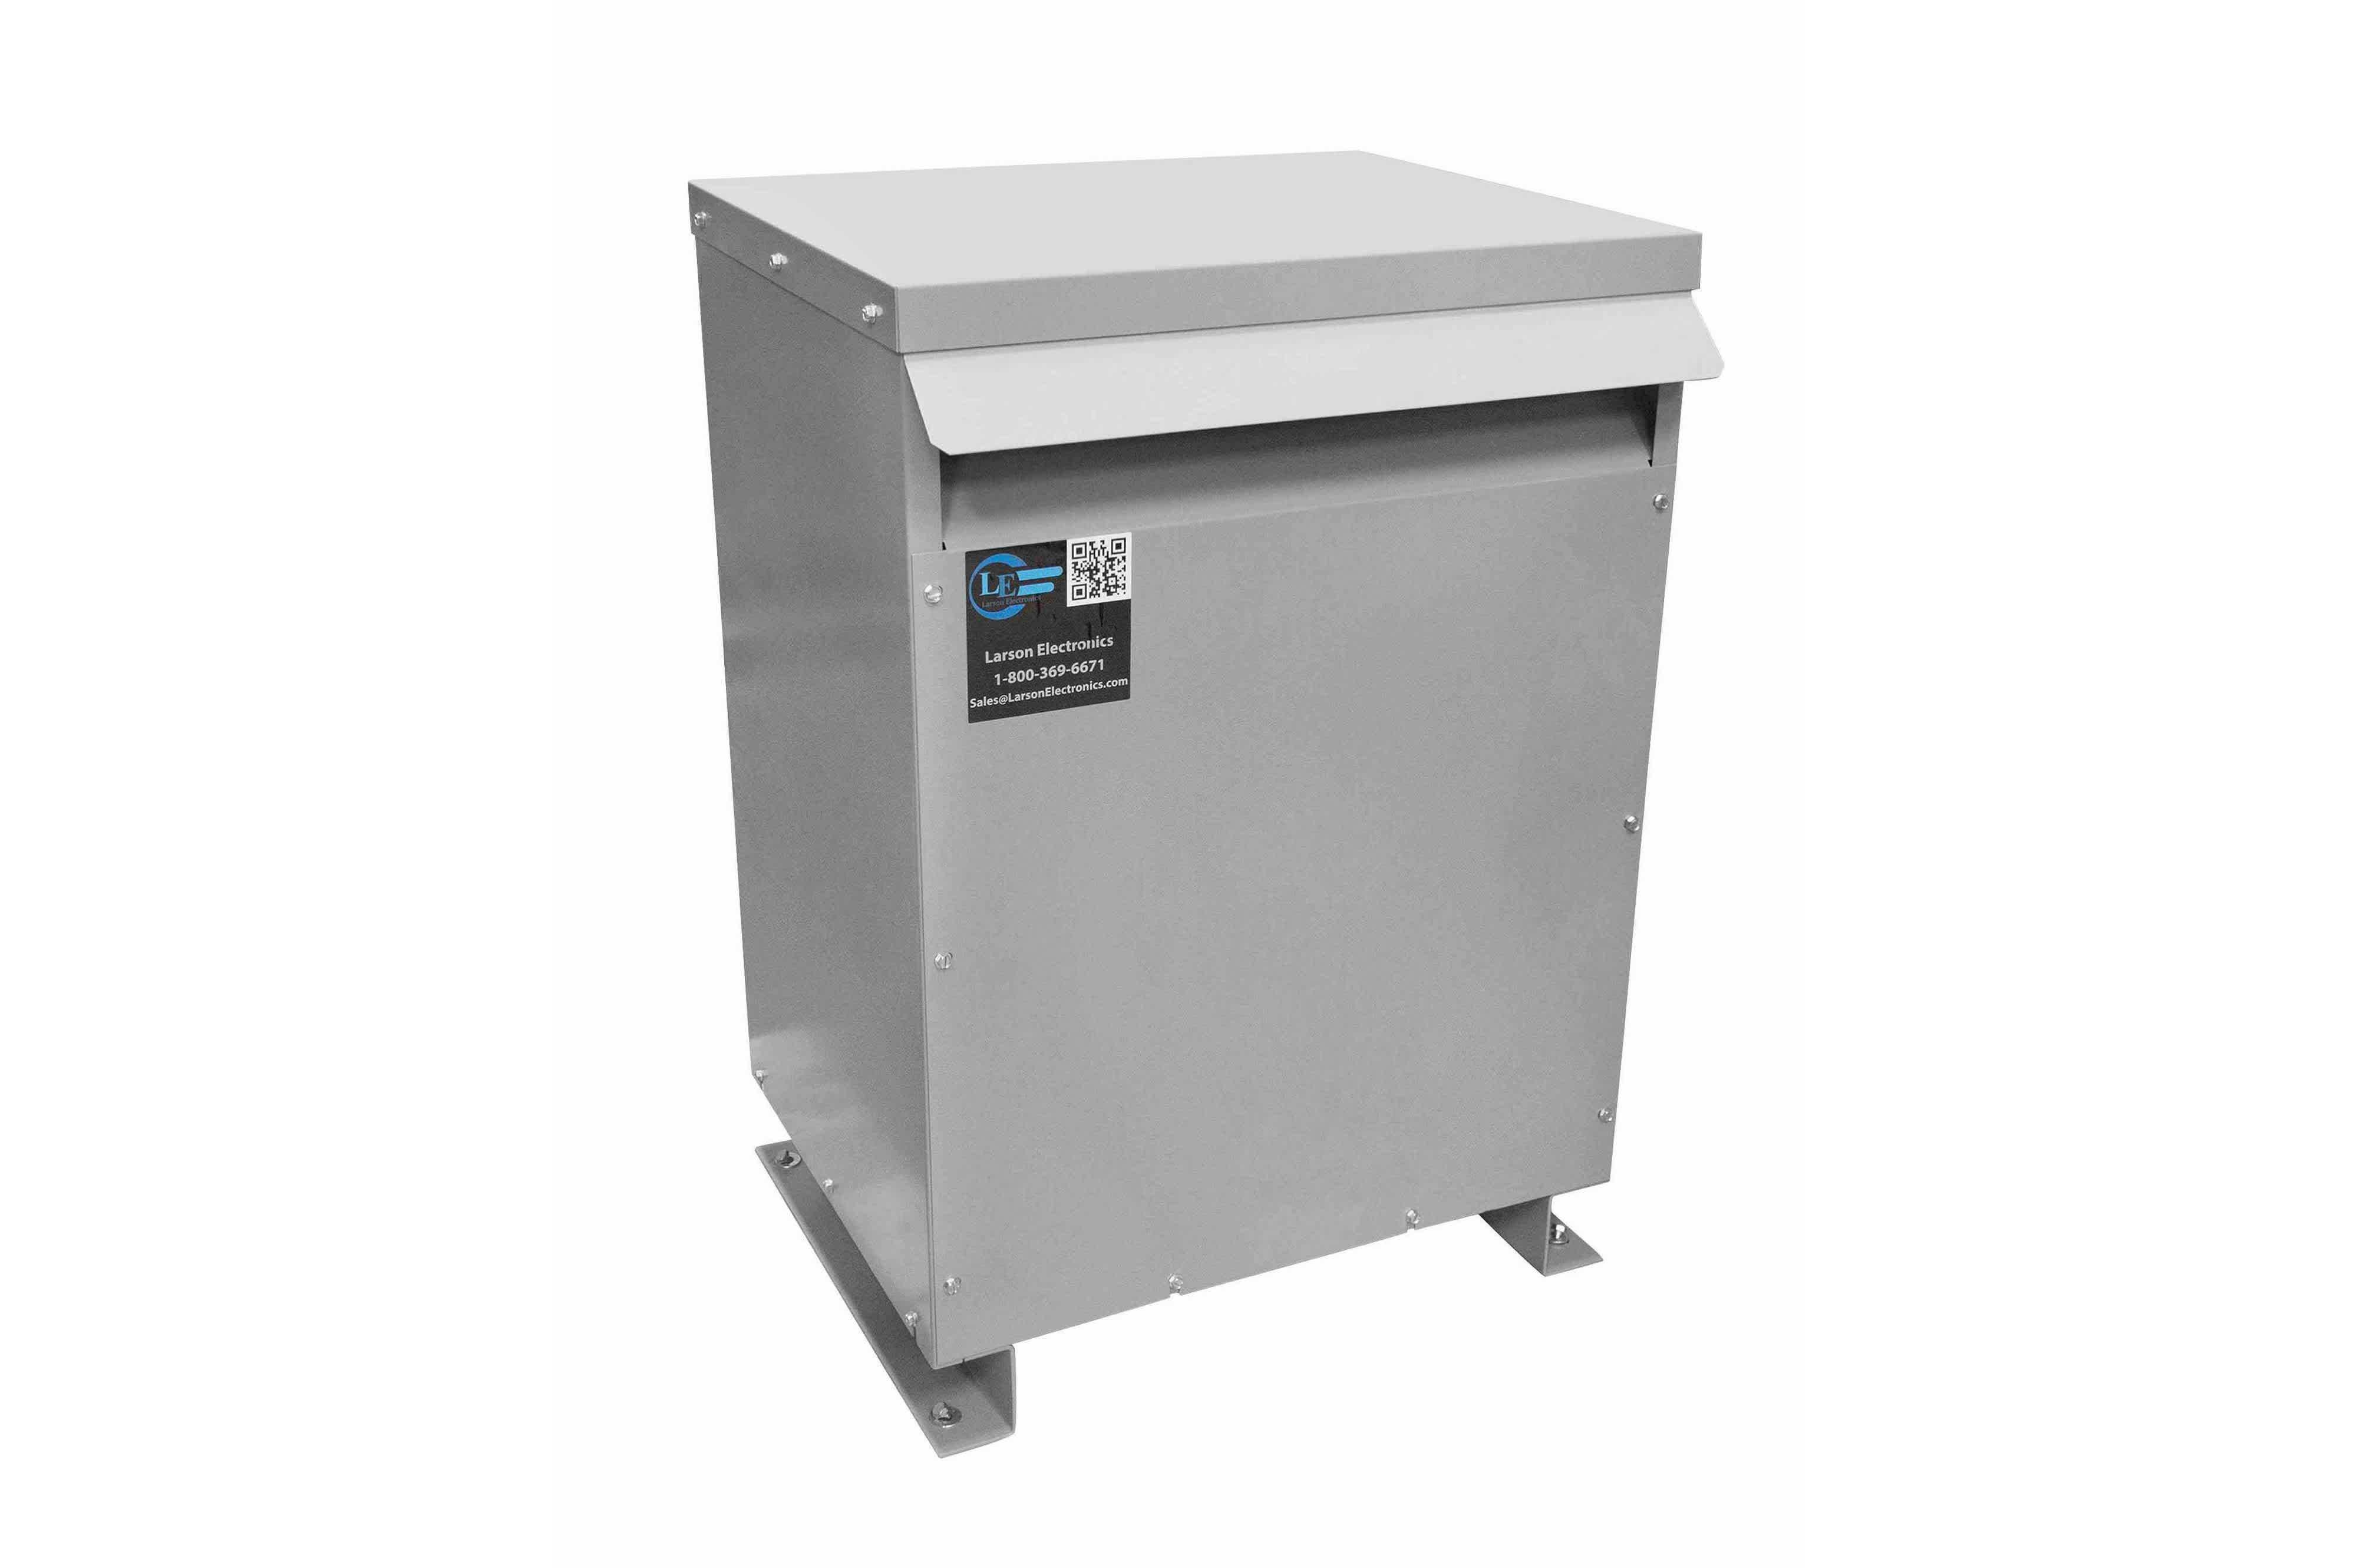 38 kVA 3PH Isolation Transformer, 240V Wye Primary, 600Y/347 Wye-N Secondary, N3R, Ventilated, 60 Hz